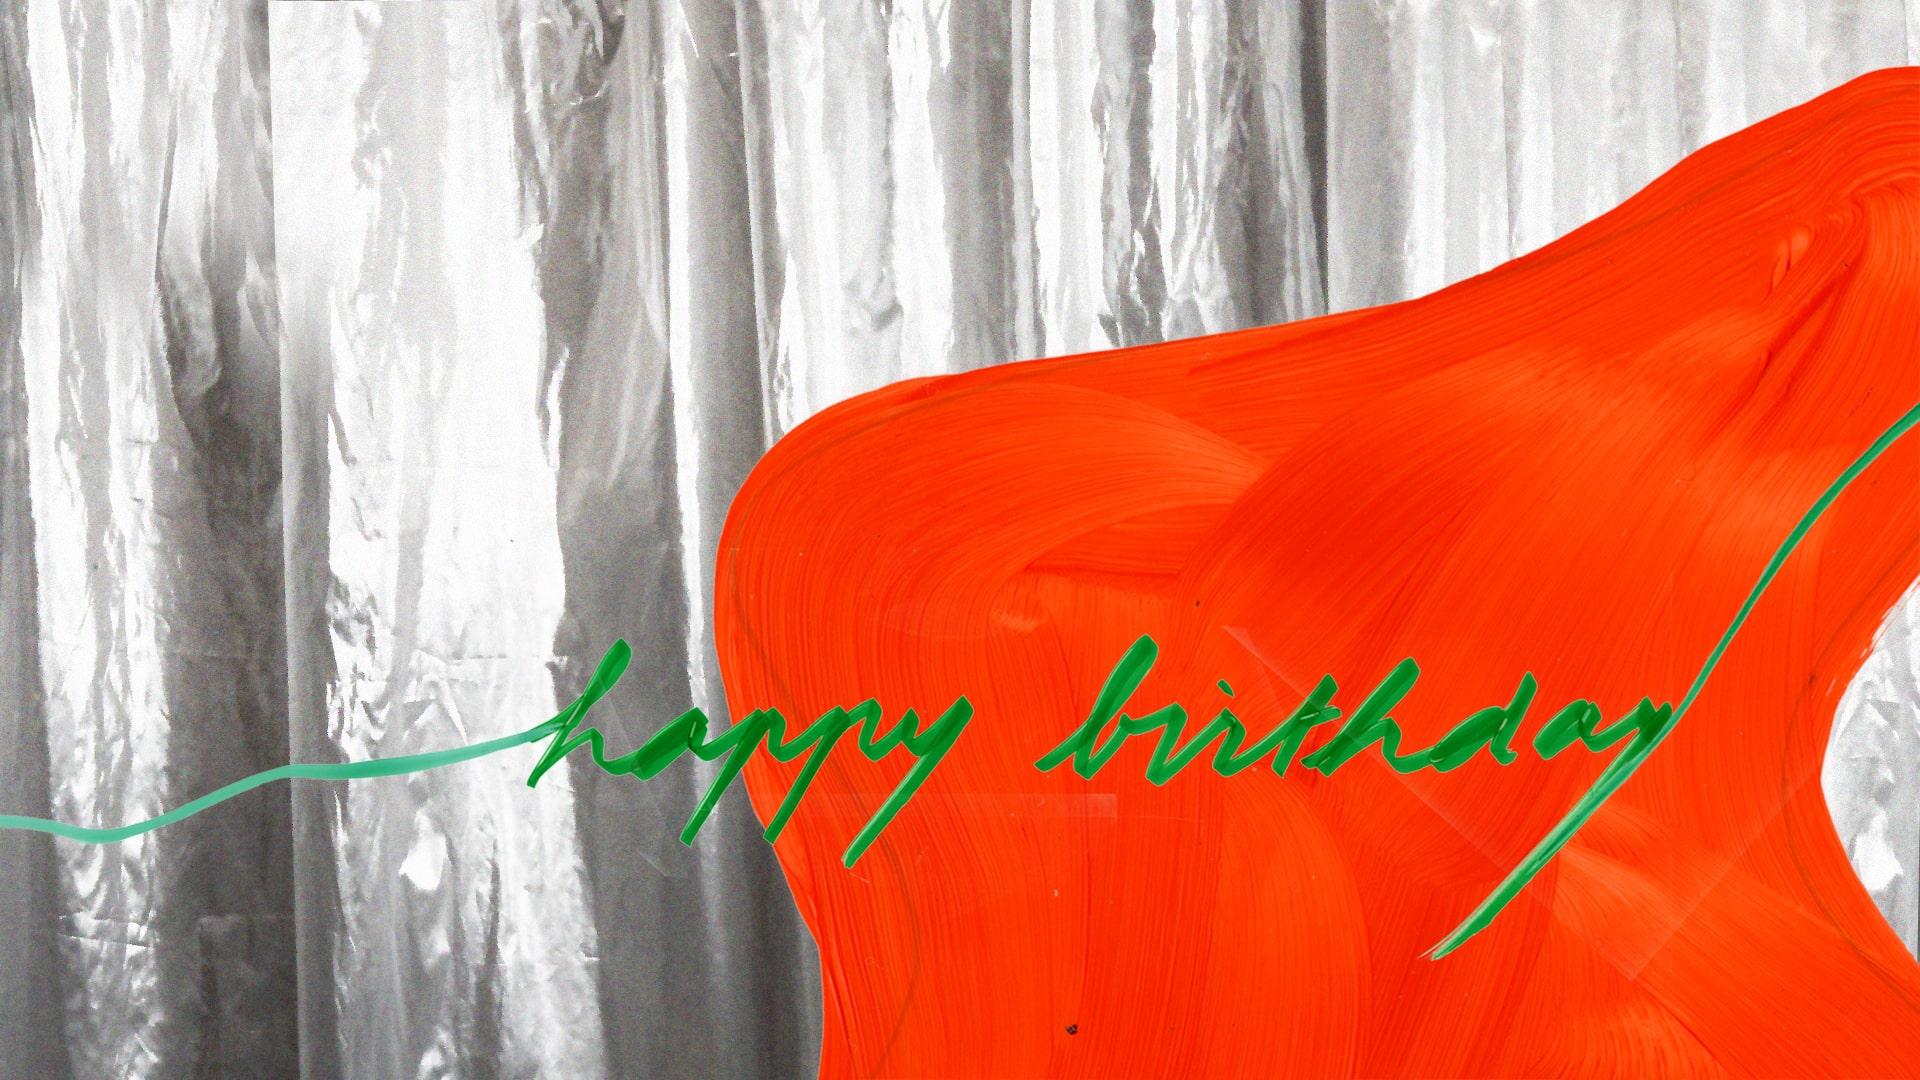 Happy Birthday Petite Friture